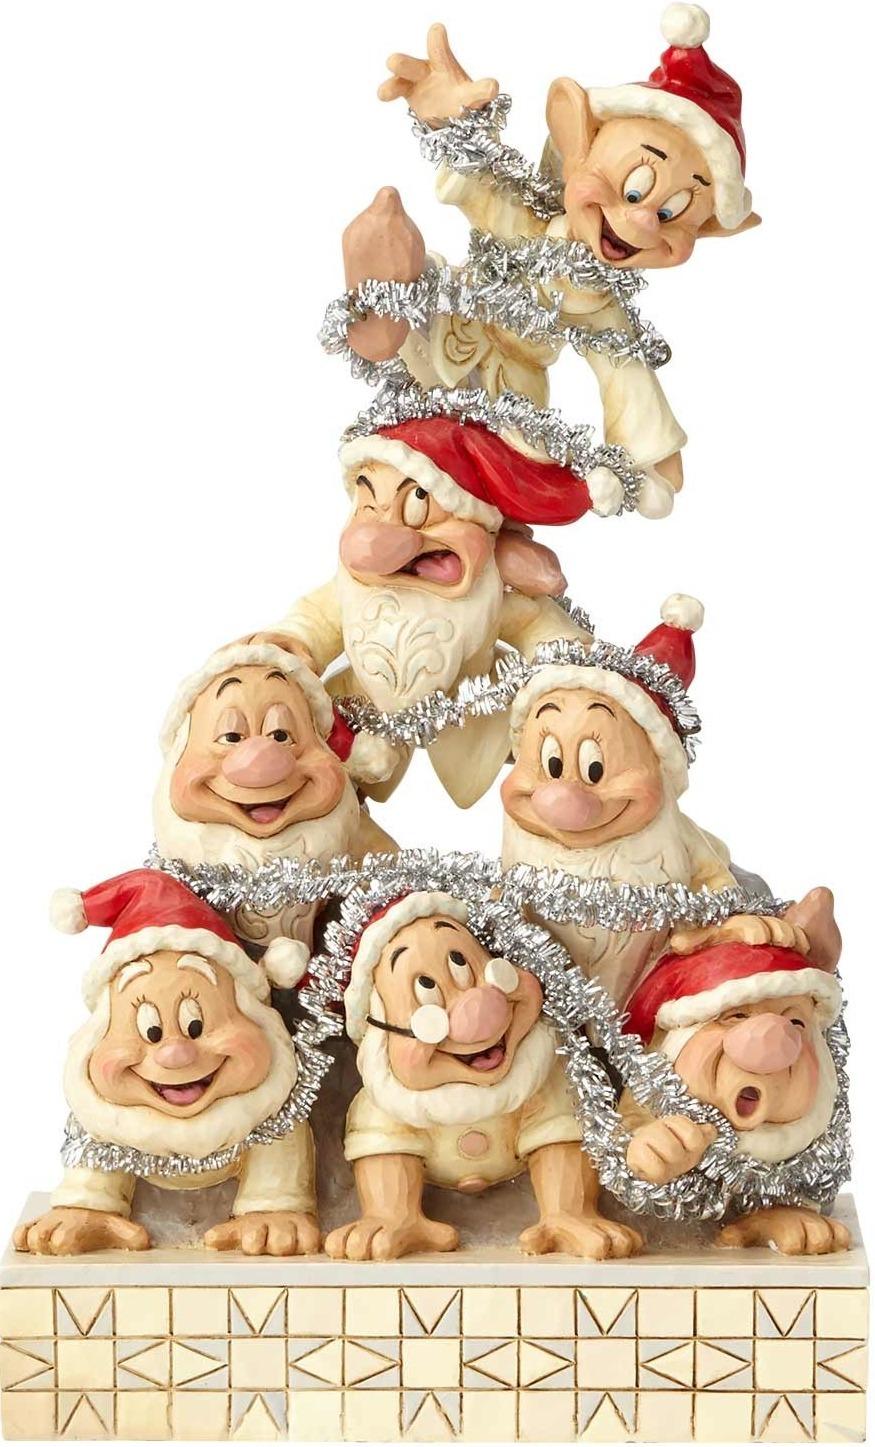 Jim Shore Disney 6000942 Seven Dwarfs White Wonderland